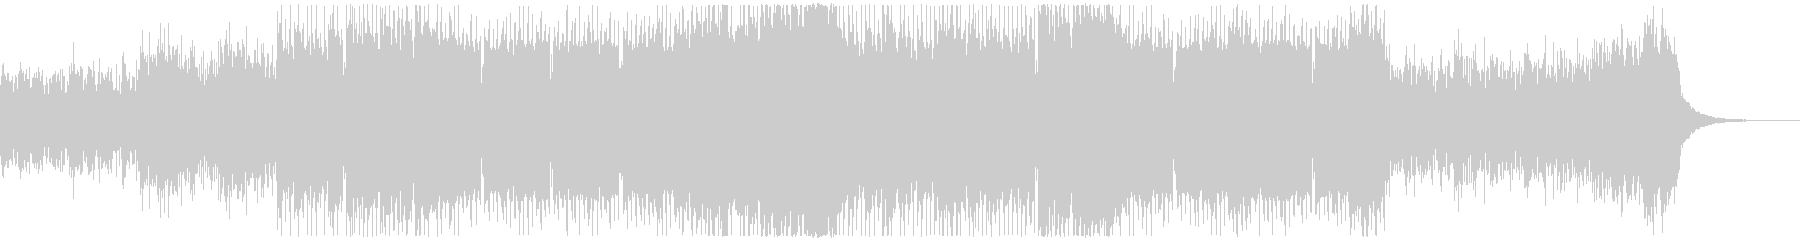 80'sディスコサウンド 2020verの未再生の波形